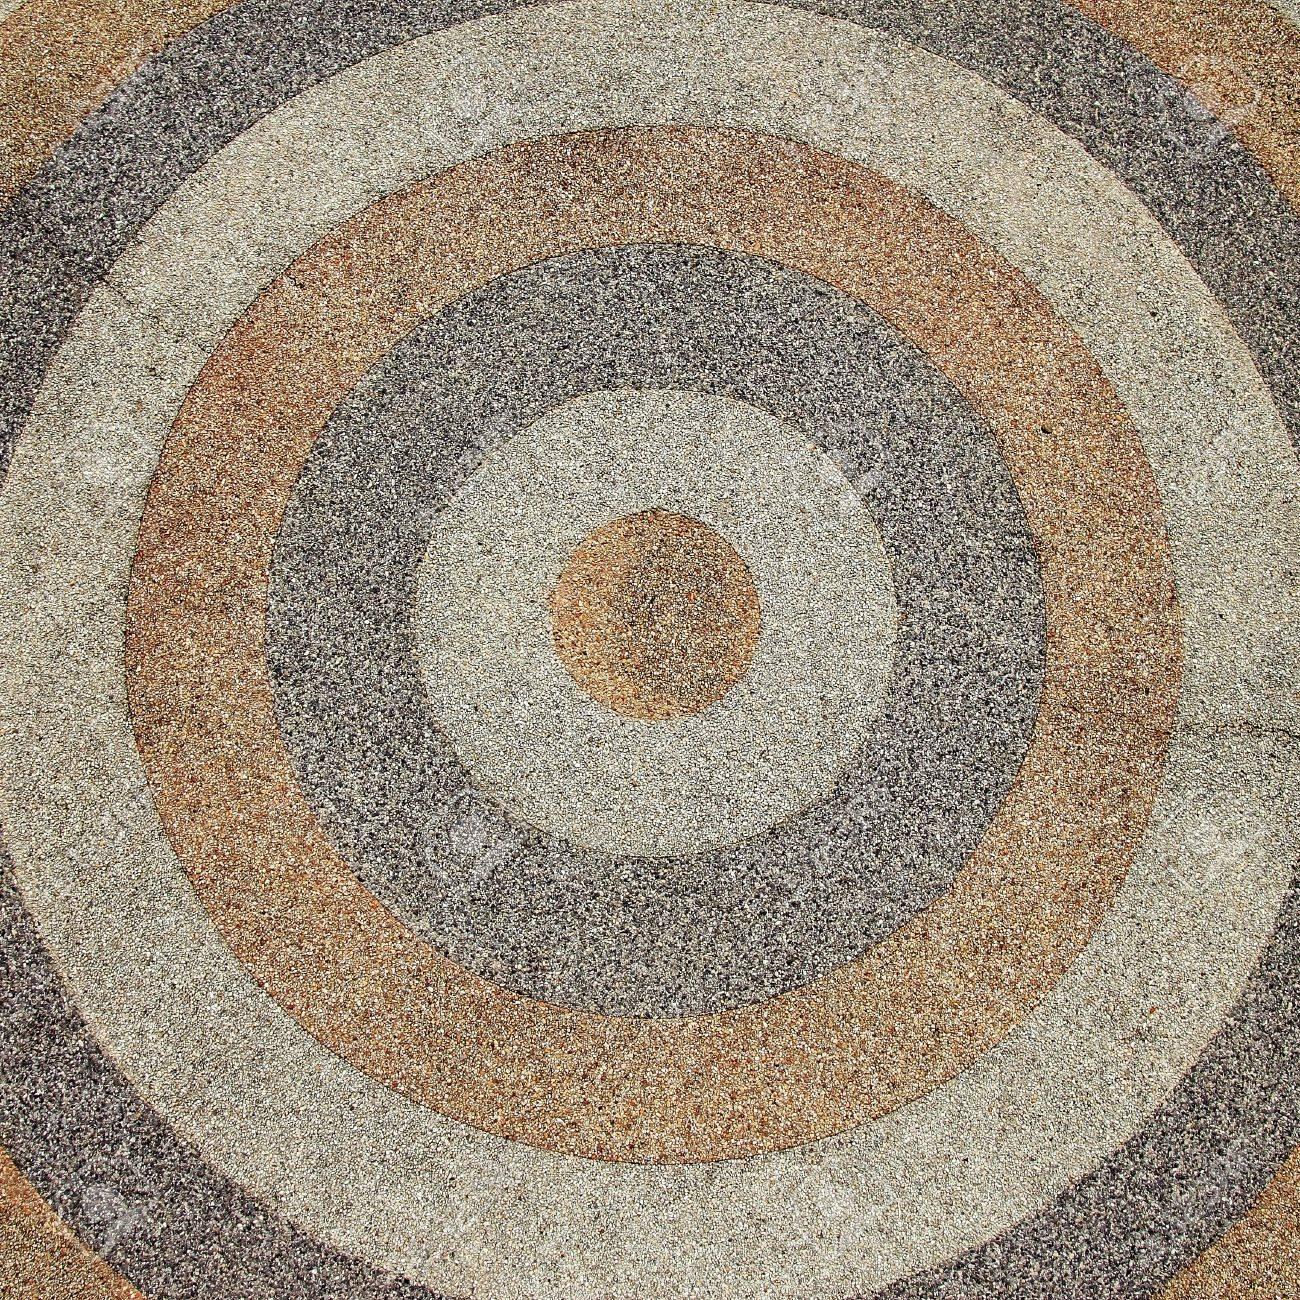 circle stone texture background Stock Photo - 12233300